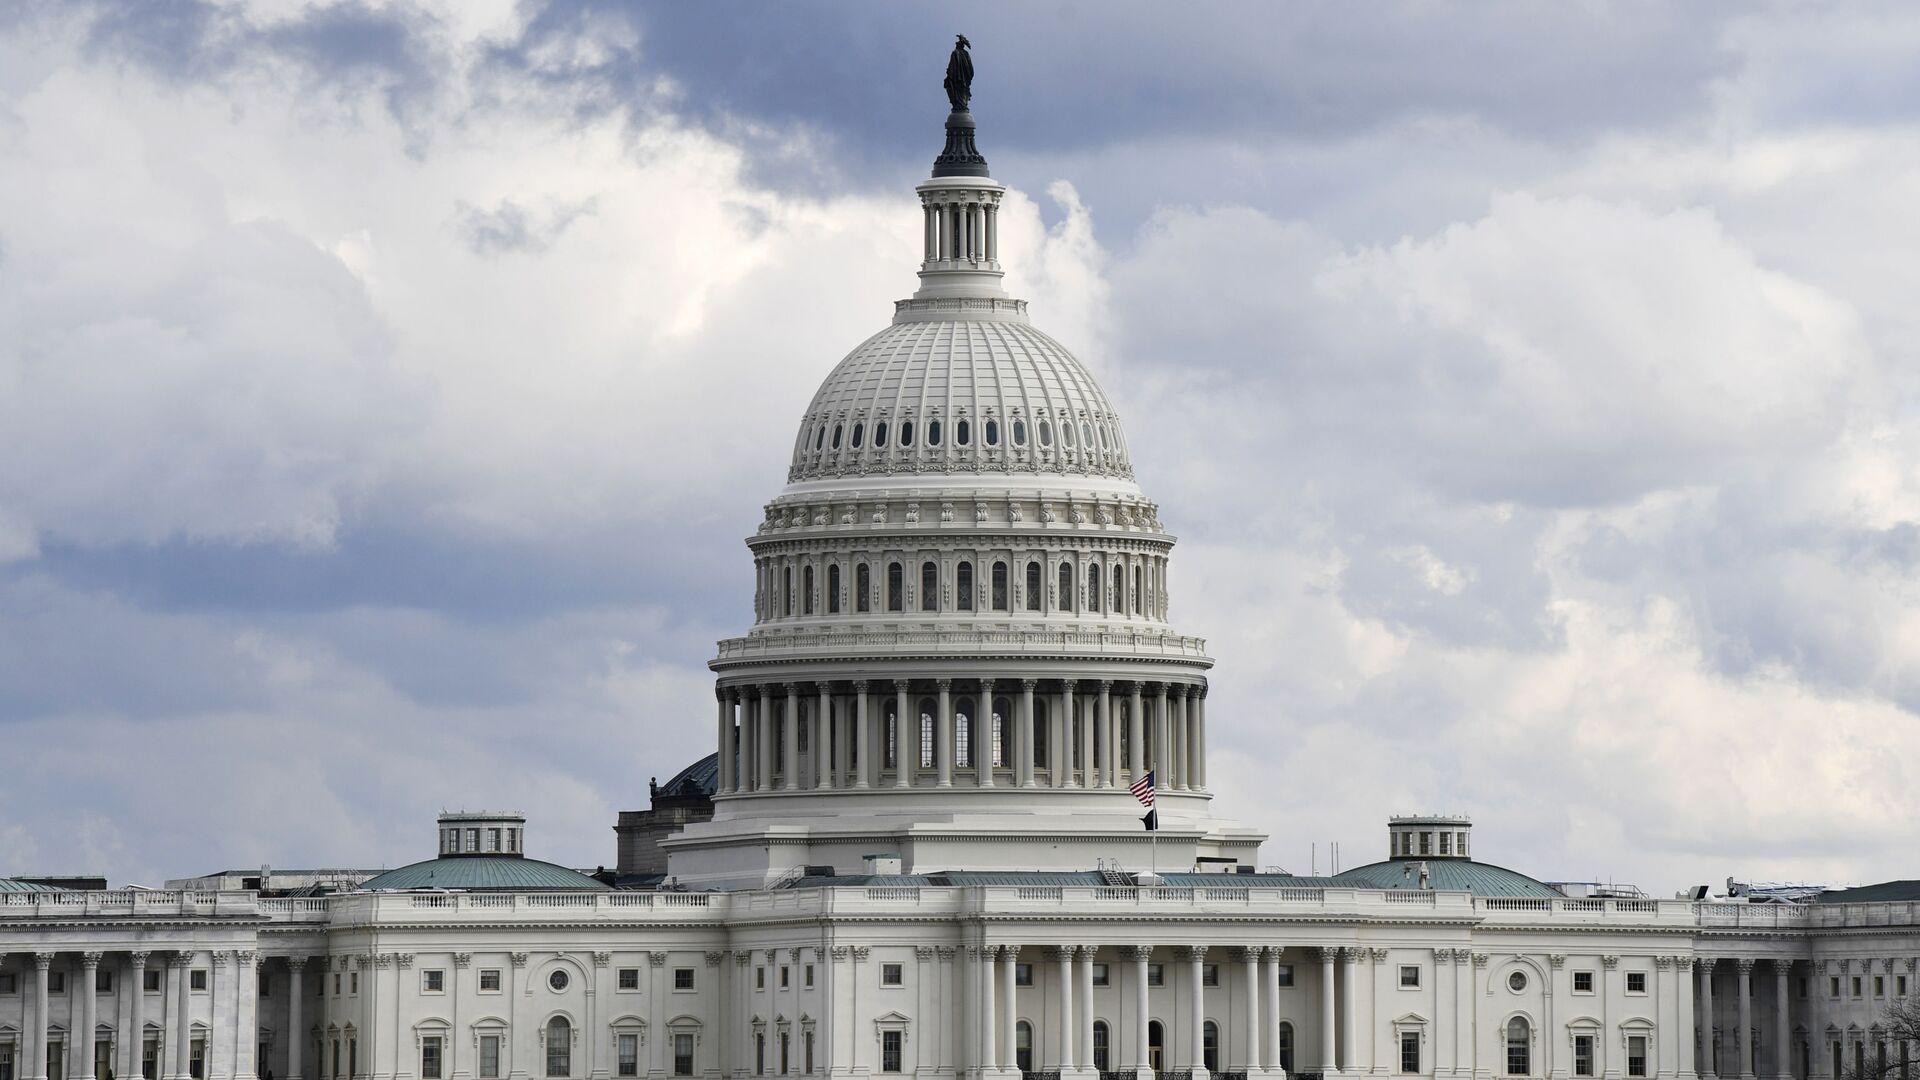 Зграда америчког Конгреса у Вашингтону - Sputnik Србија, 1920, 30.08.2021